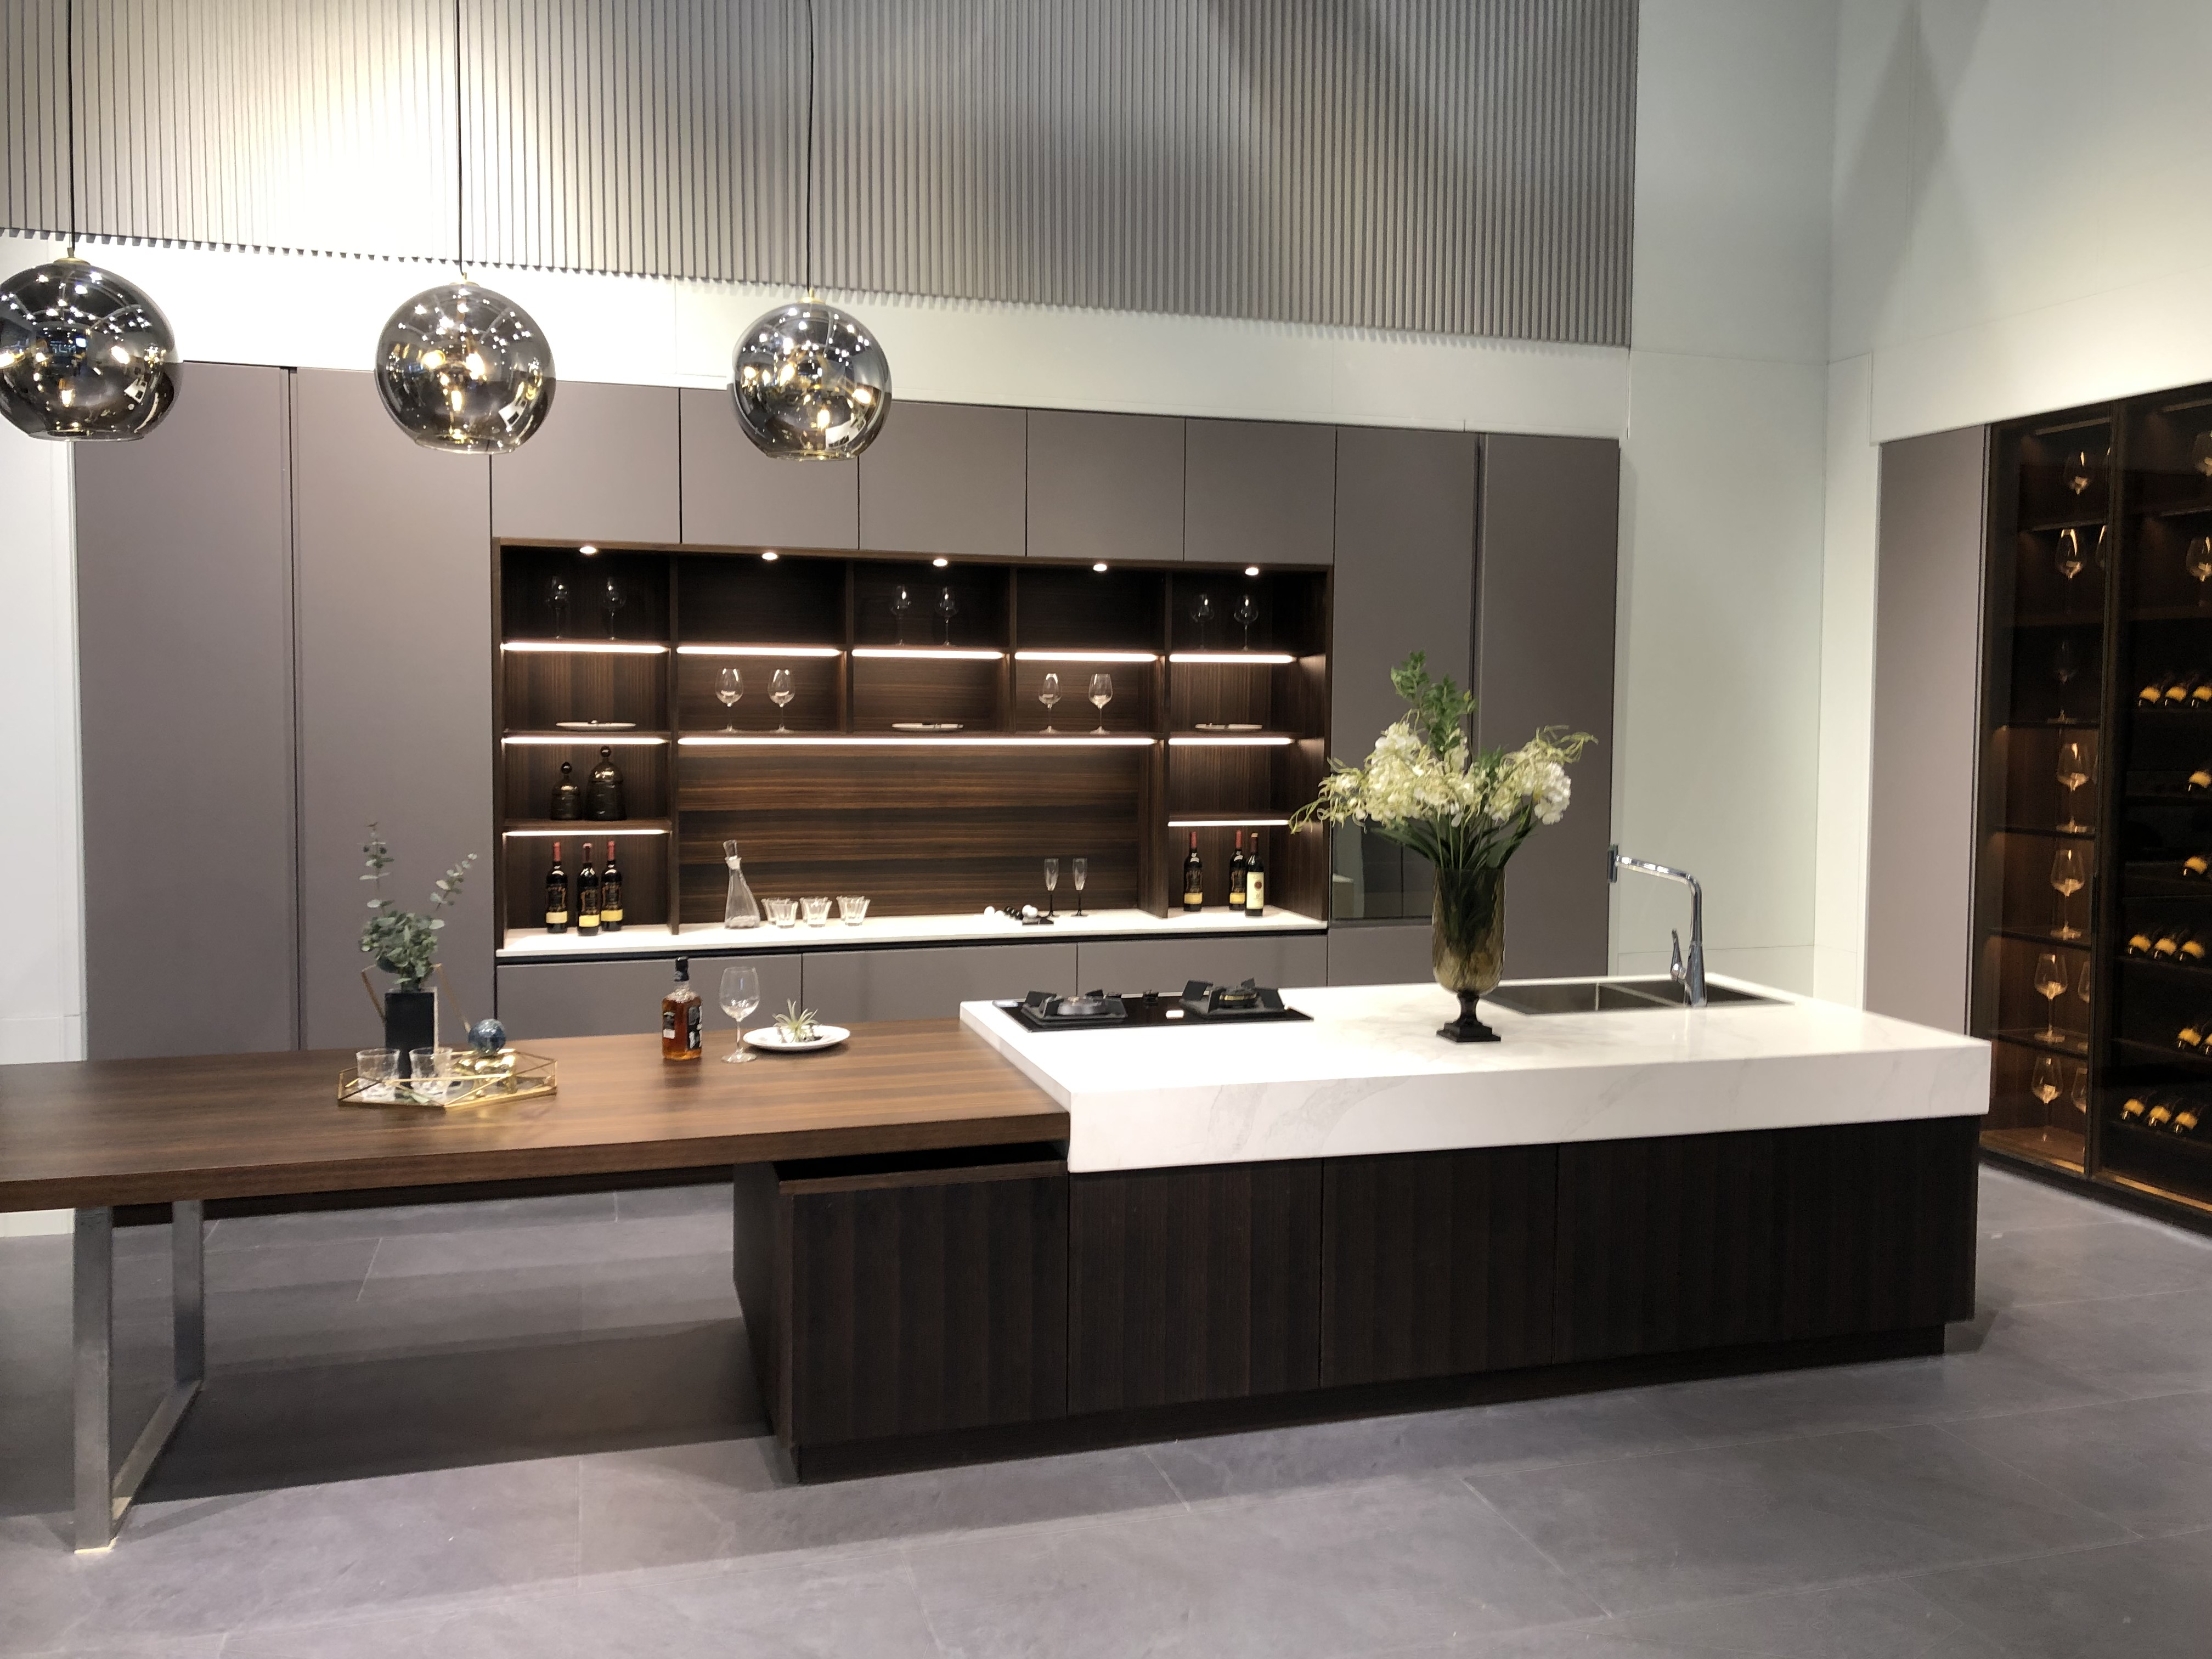 2020 Discountable price Modern Design Wooden Customized ... on Kitchen Modern Design 2020  id=14657